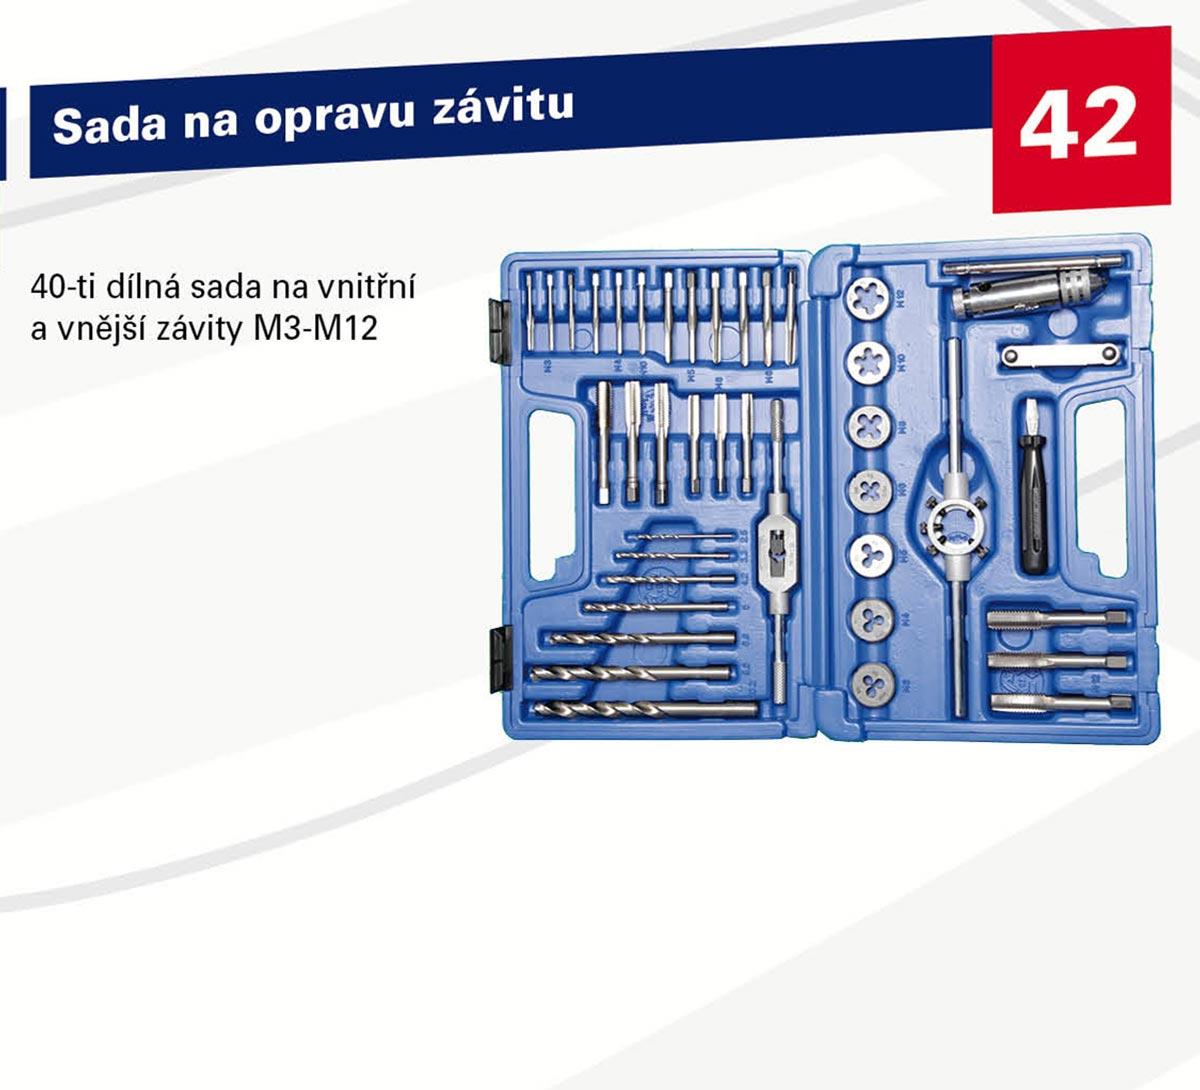 půjčovna č. 42